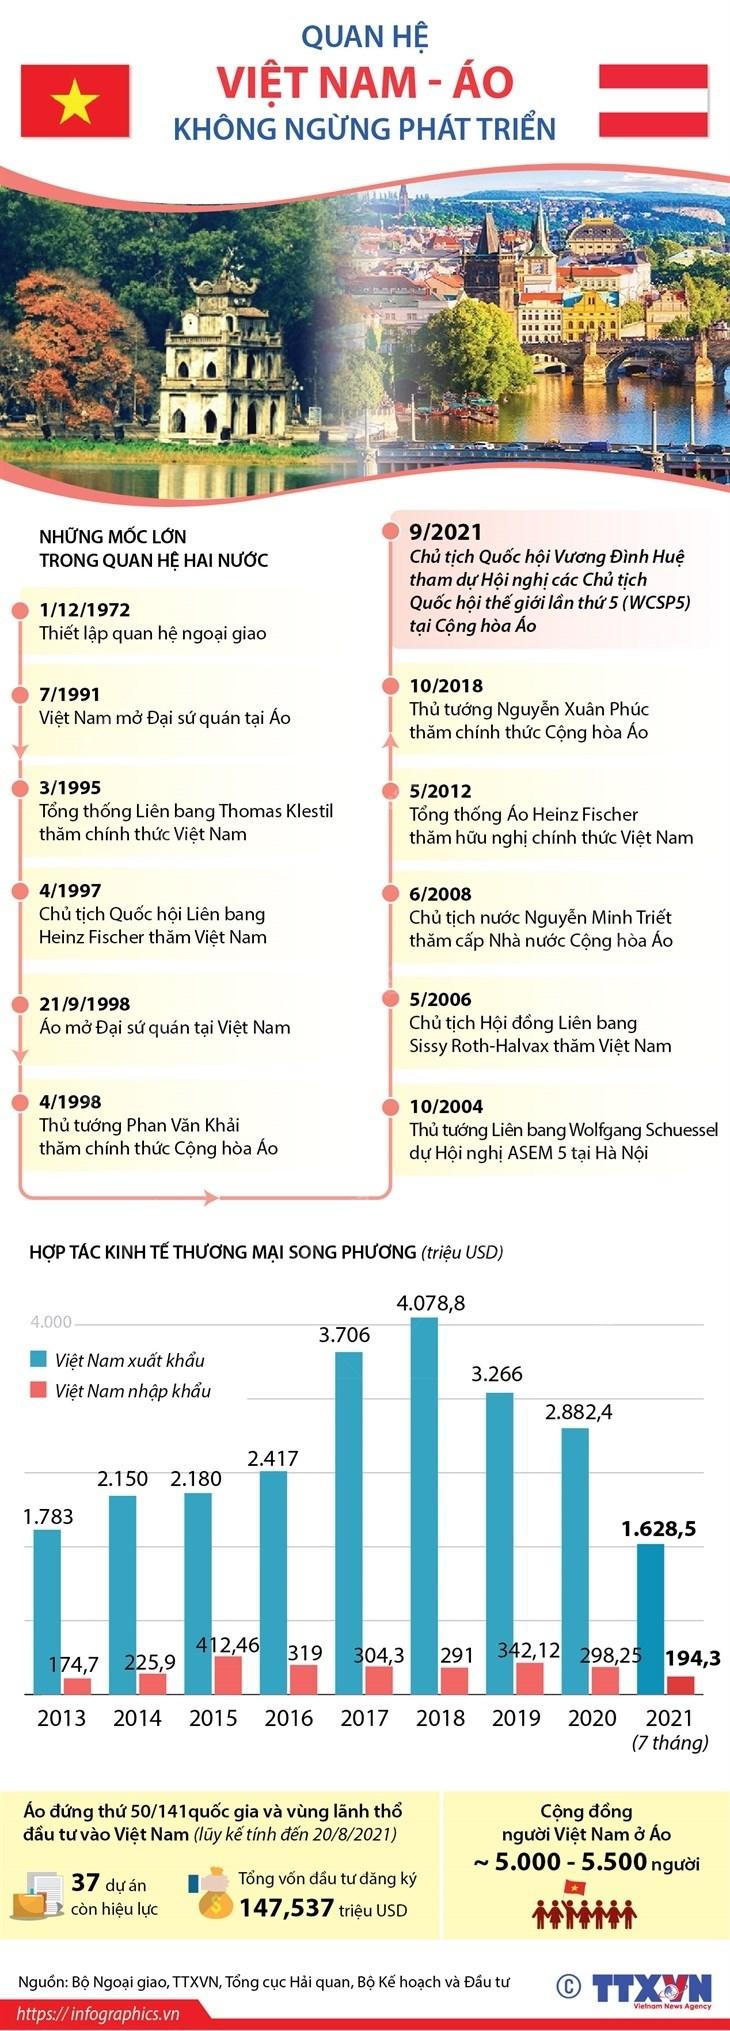 [Infographics] Quan he song phuong Viet Nam-Ao khong ngung phat trien hinh anh 1